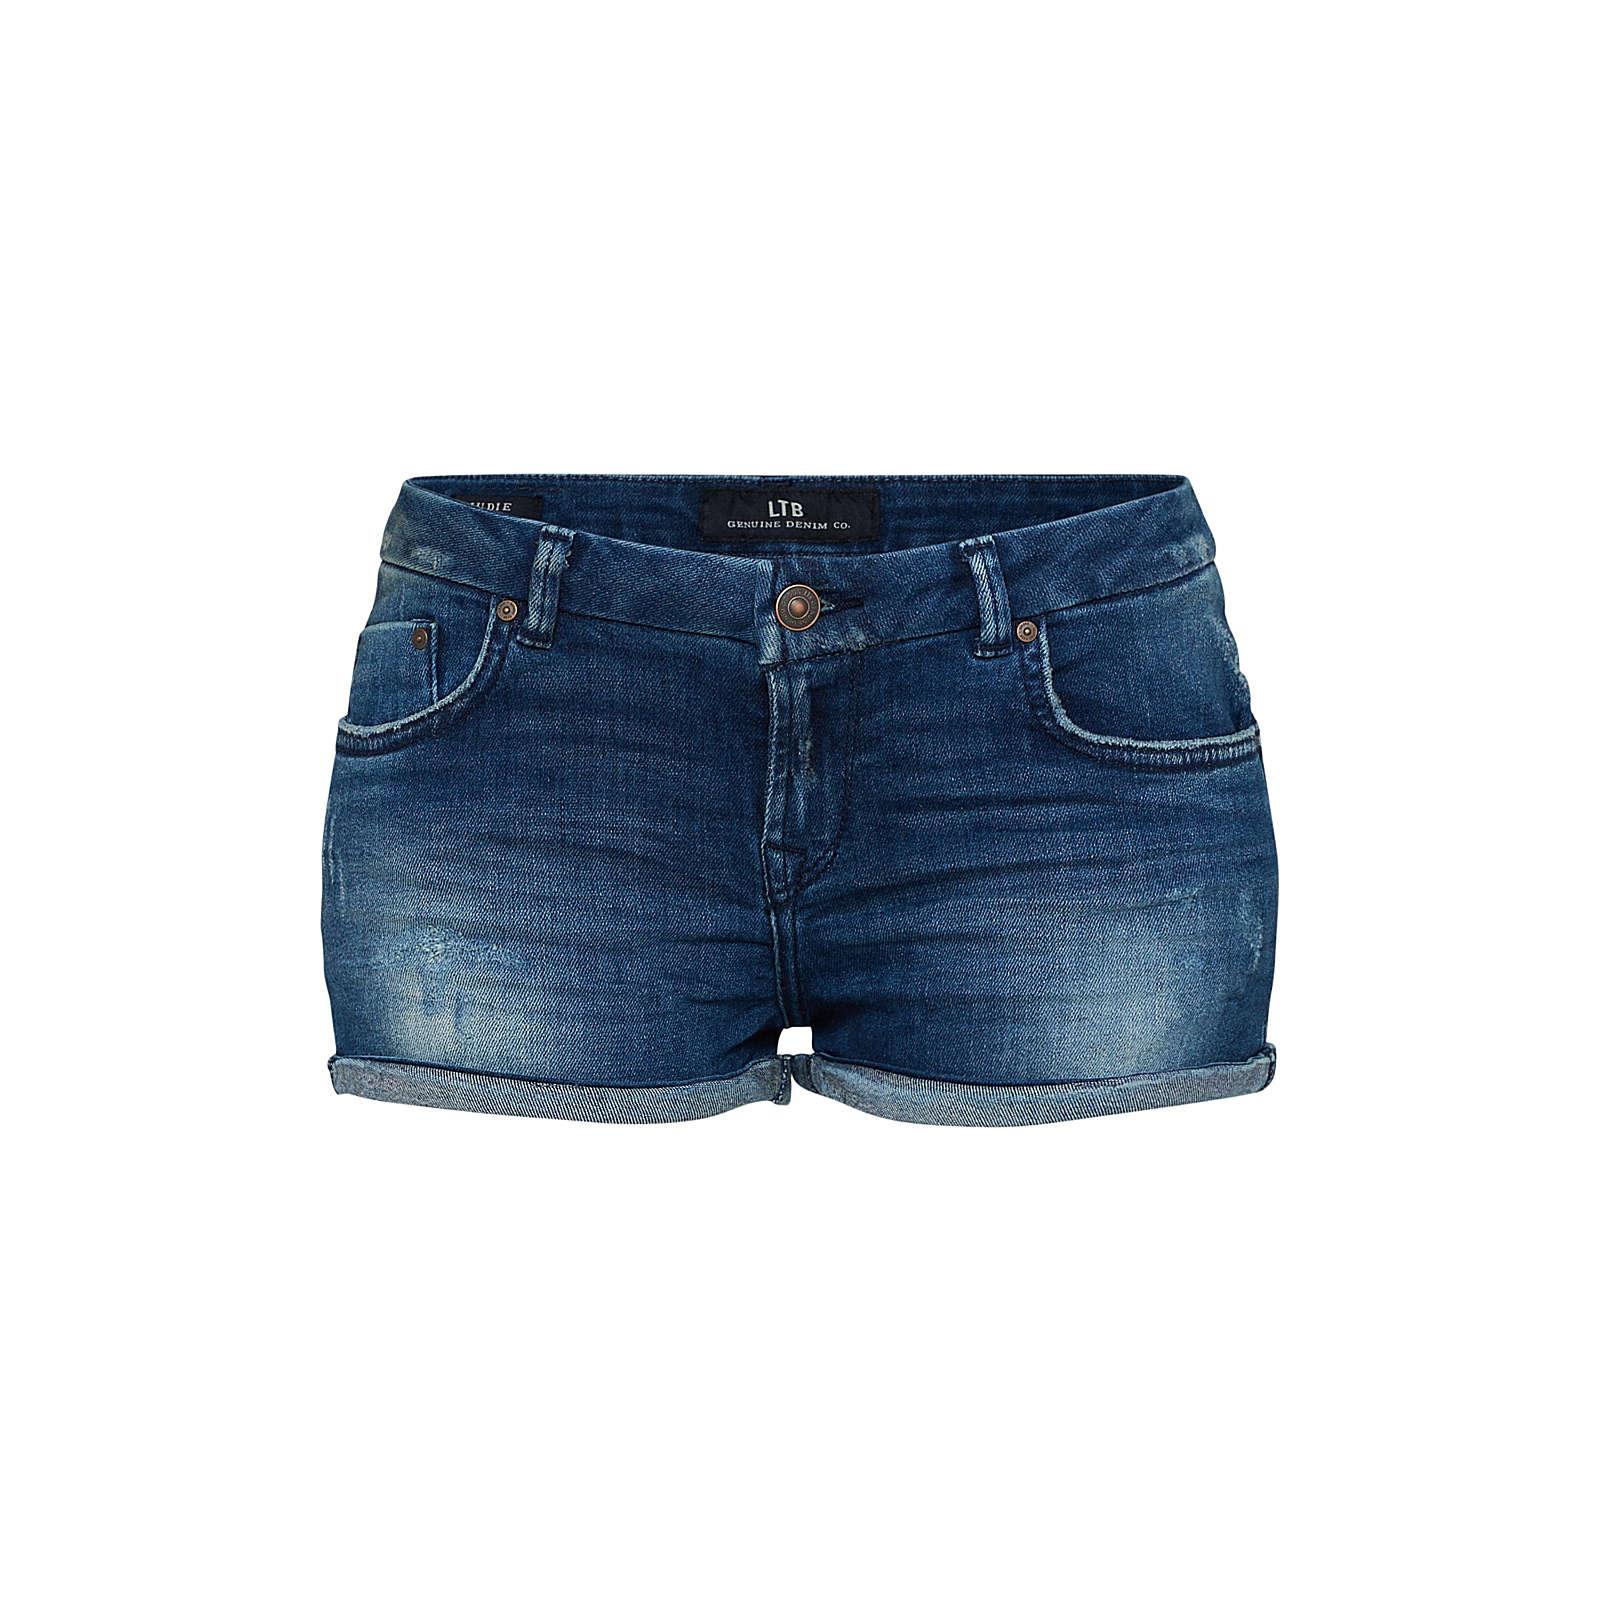 LTB Jeans Jeansshorts blau Damen Gr. 40